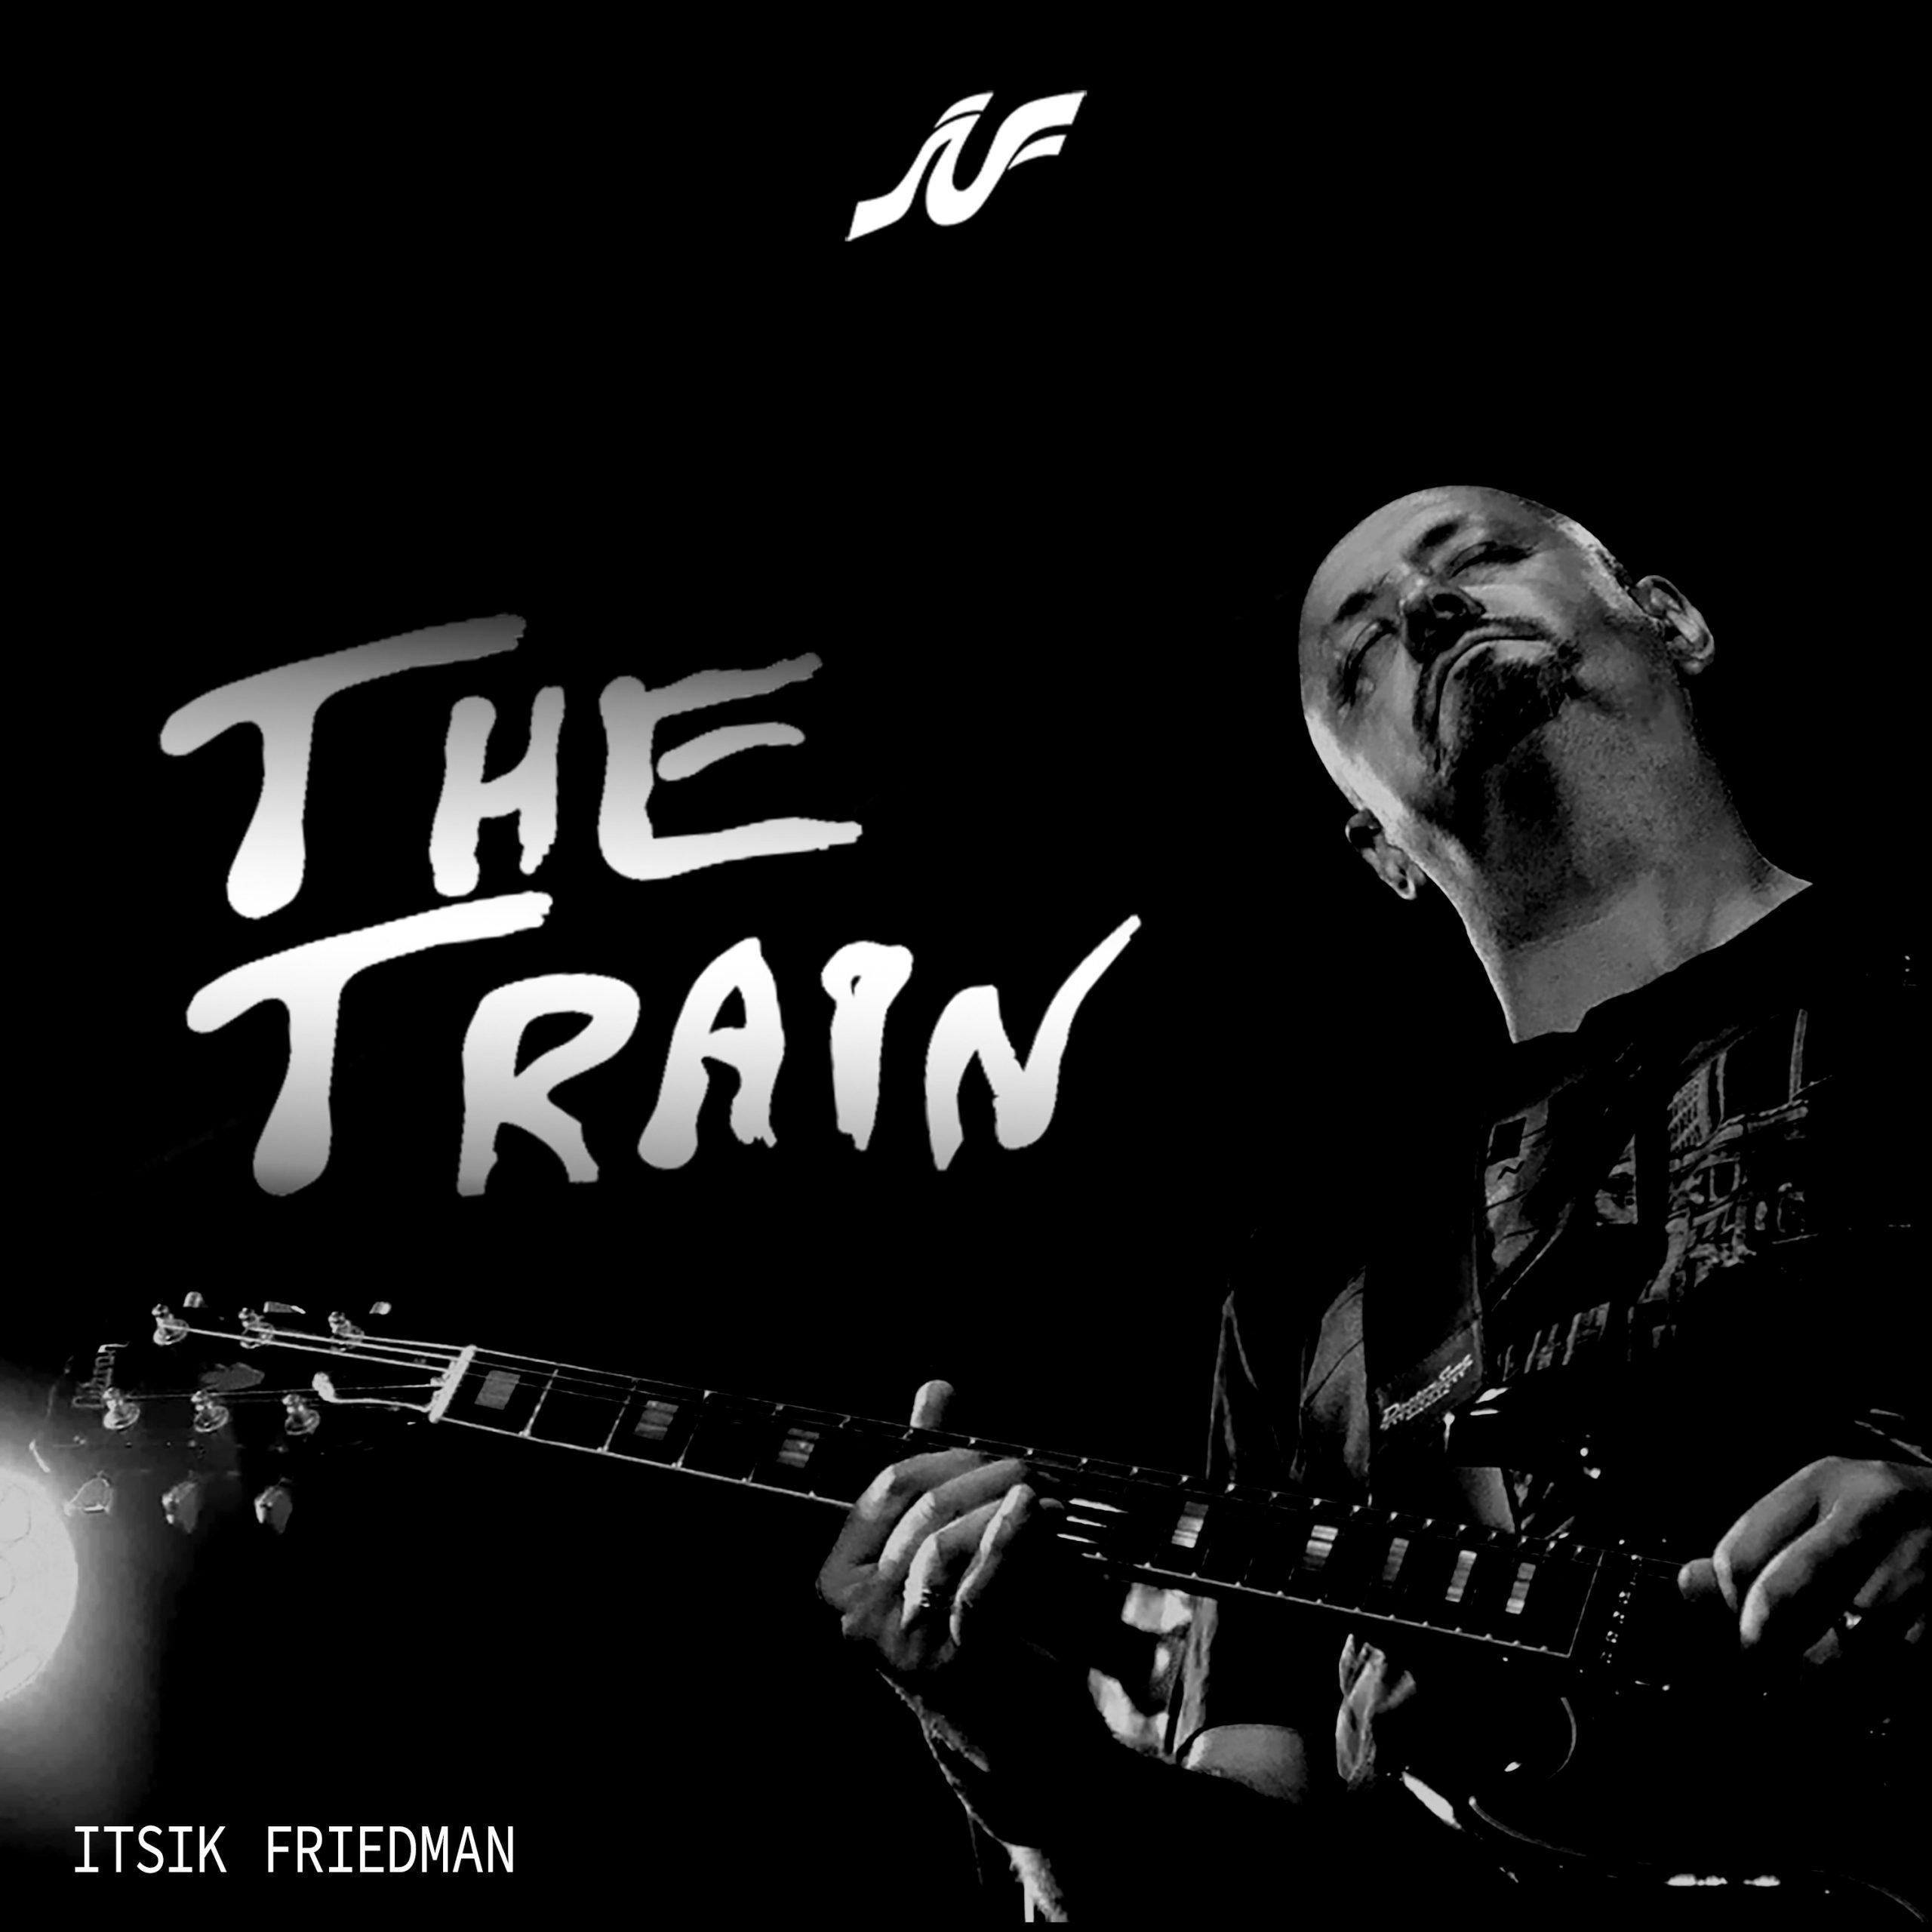 THE TRAIN - סינגל חדש לאיציק פרידמן - אולפן הקלטות - אולפני הקלטות - אולפני סטורם